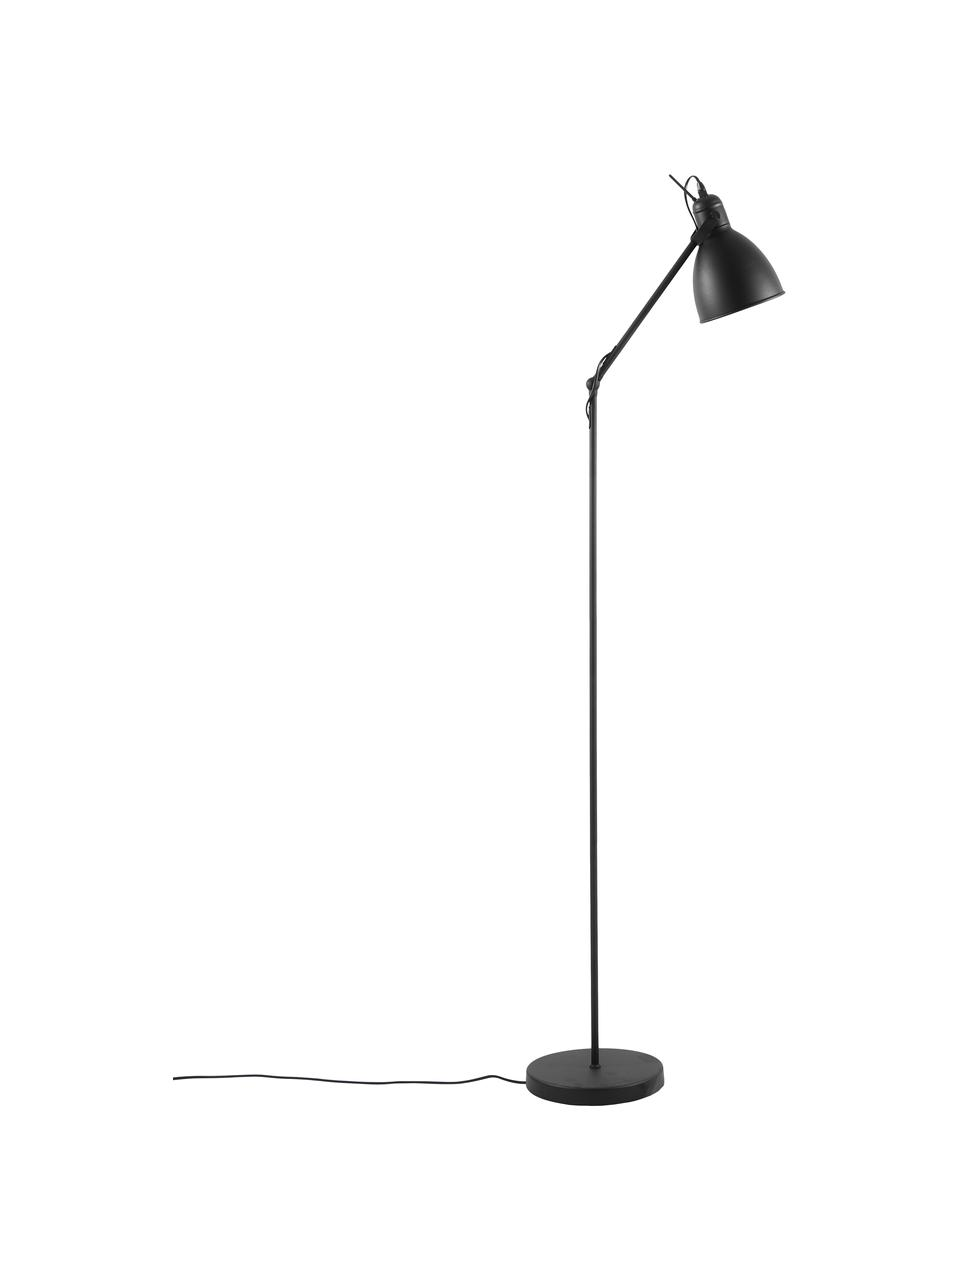 Industriële leeslamp Ethan van metaal, Lampenkap: gepoedercoat metaal, Lampvoet: gepoedercoat metaal, Zwart, Ø 15 x H 137 cm